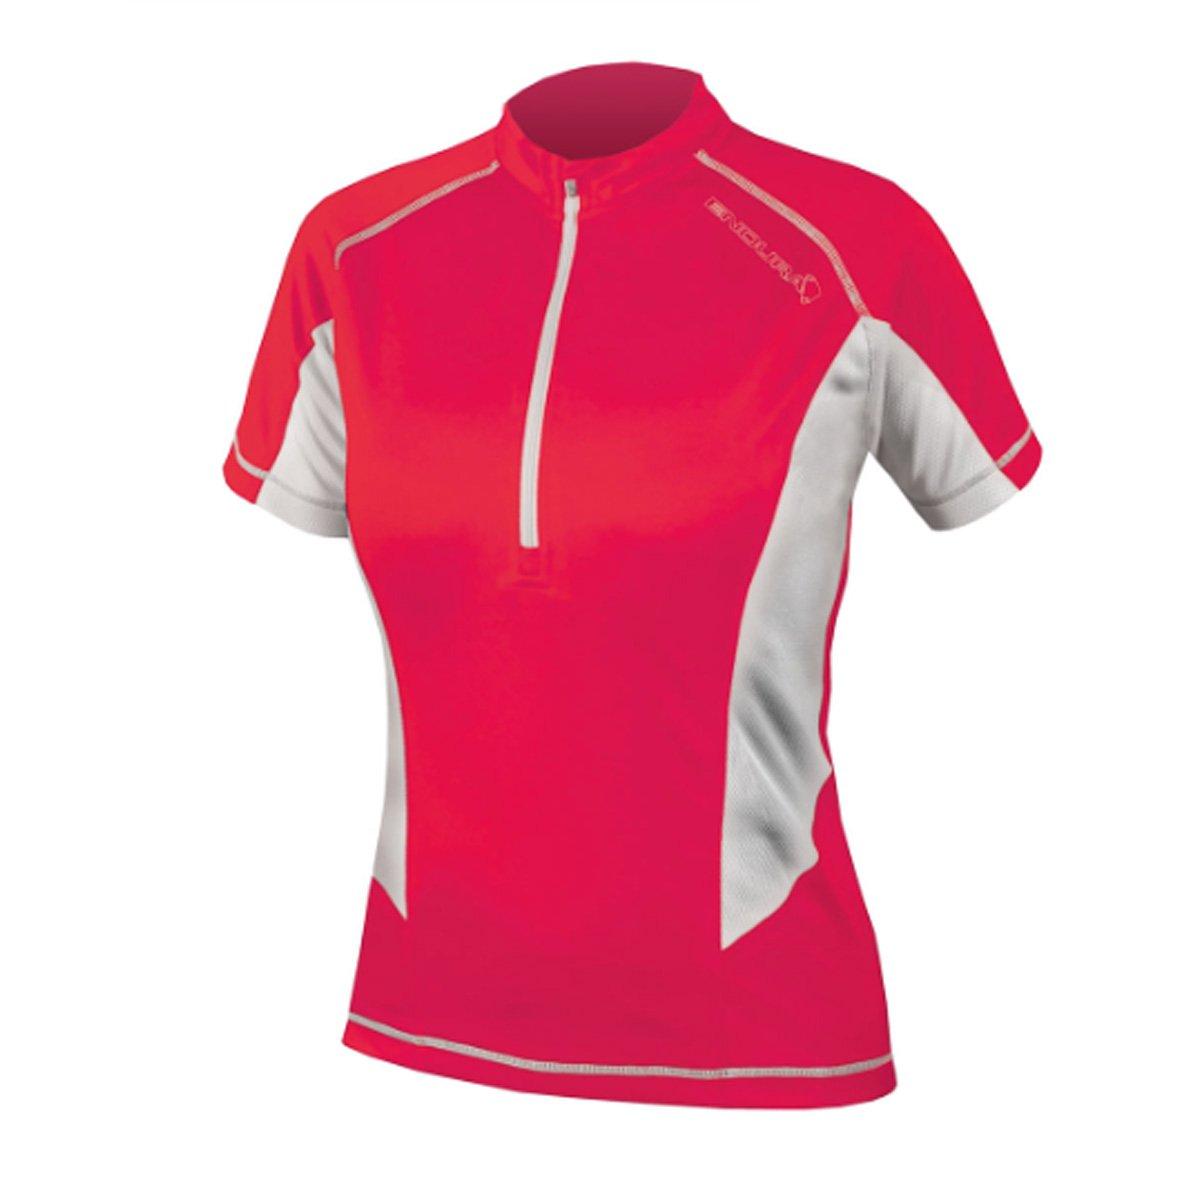 Endura Womens Pulse Short Sleeve Cycling Jersey B00J0QPIU2 Small|コーラル コーラル Small